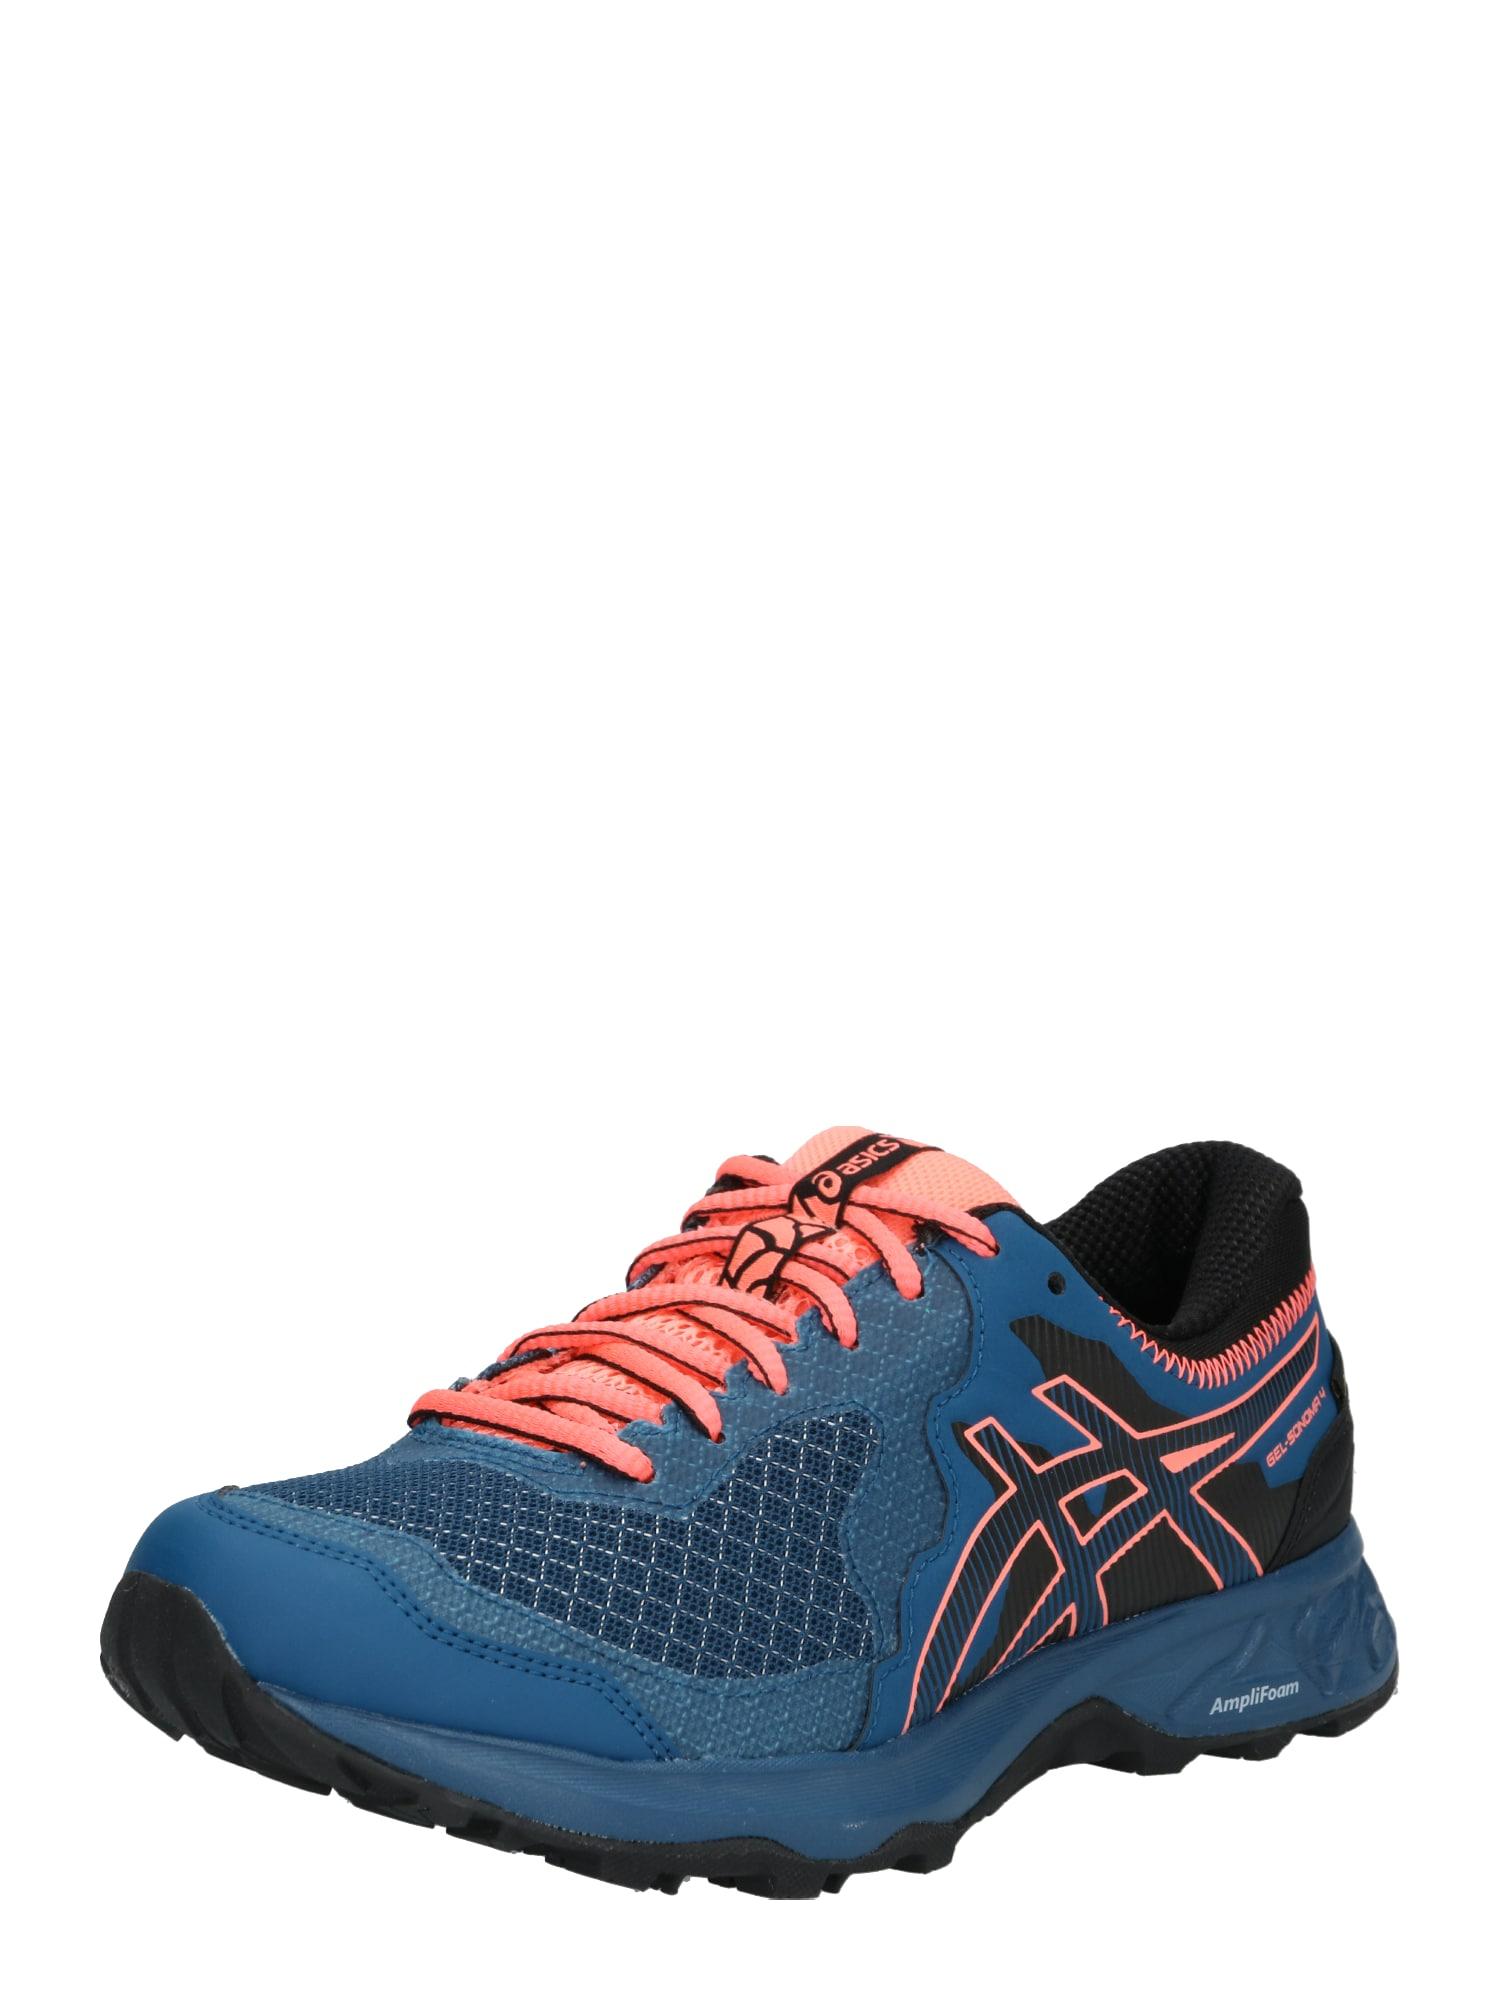 Běžecká obuv Gel-Sonoma 4 G-TX Trail tmavě modrá korálová ASICS